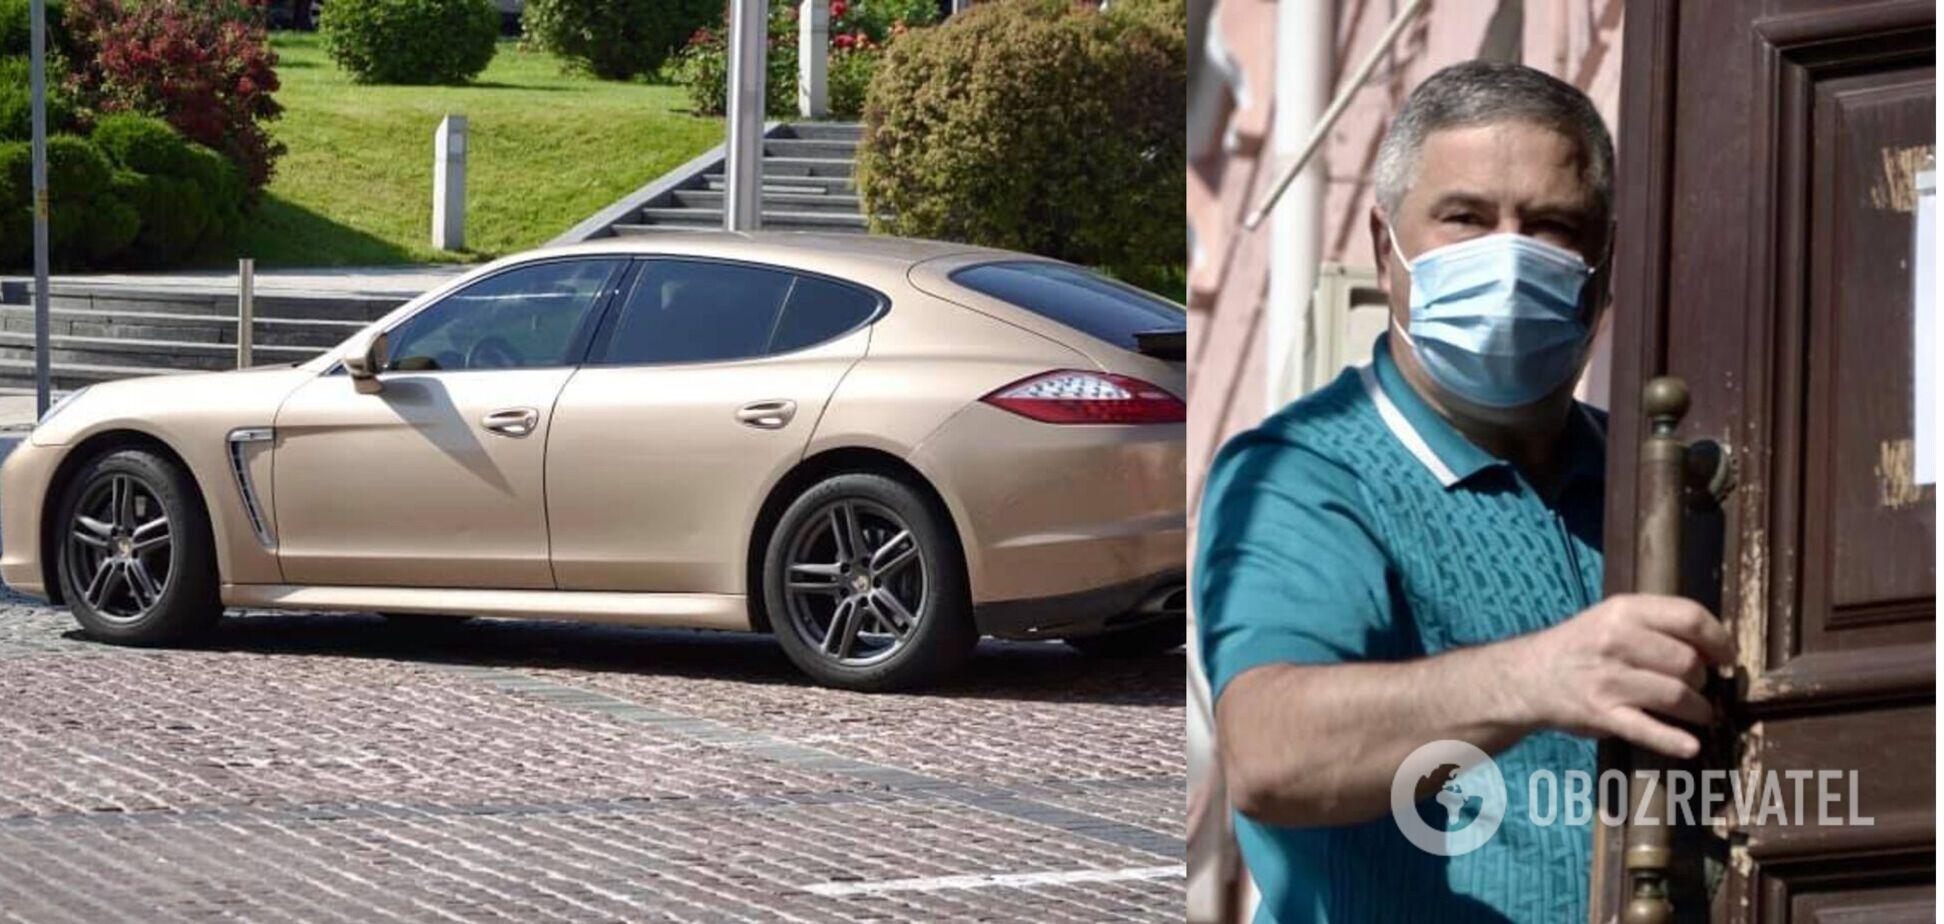 Заступник глави Окружного адмінсуду Києва приїхав на роботу на золотистому Porsche. Фото